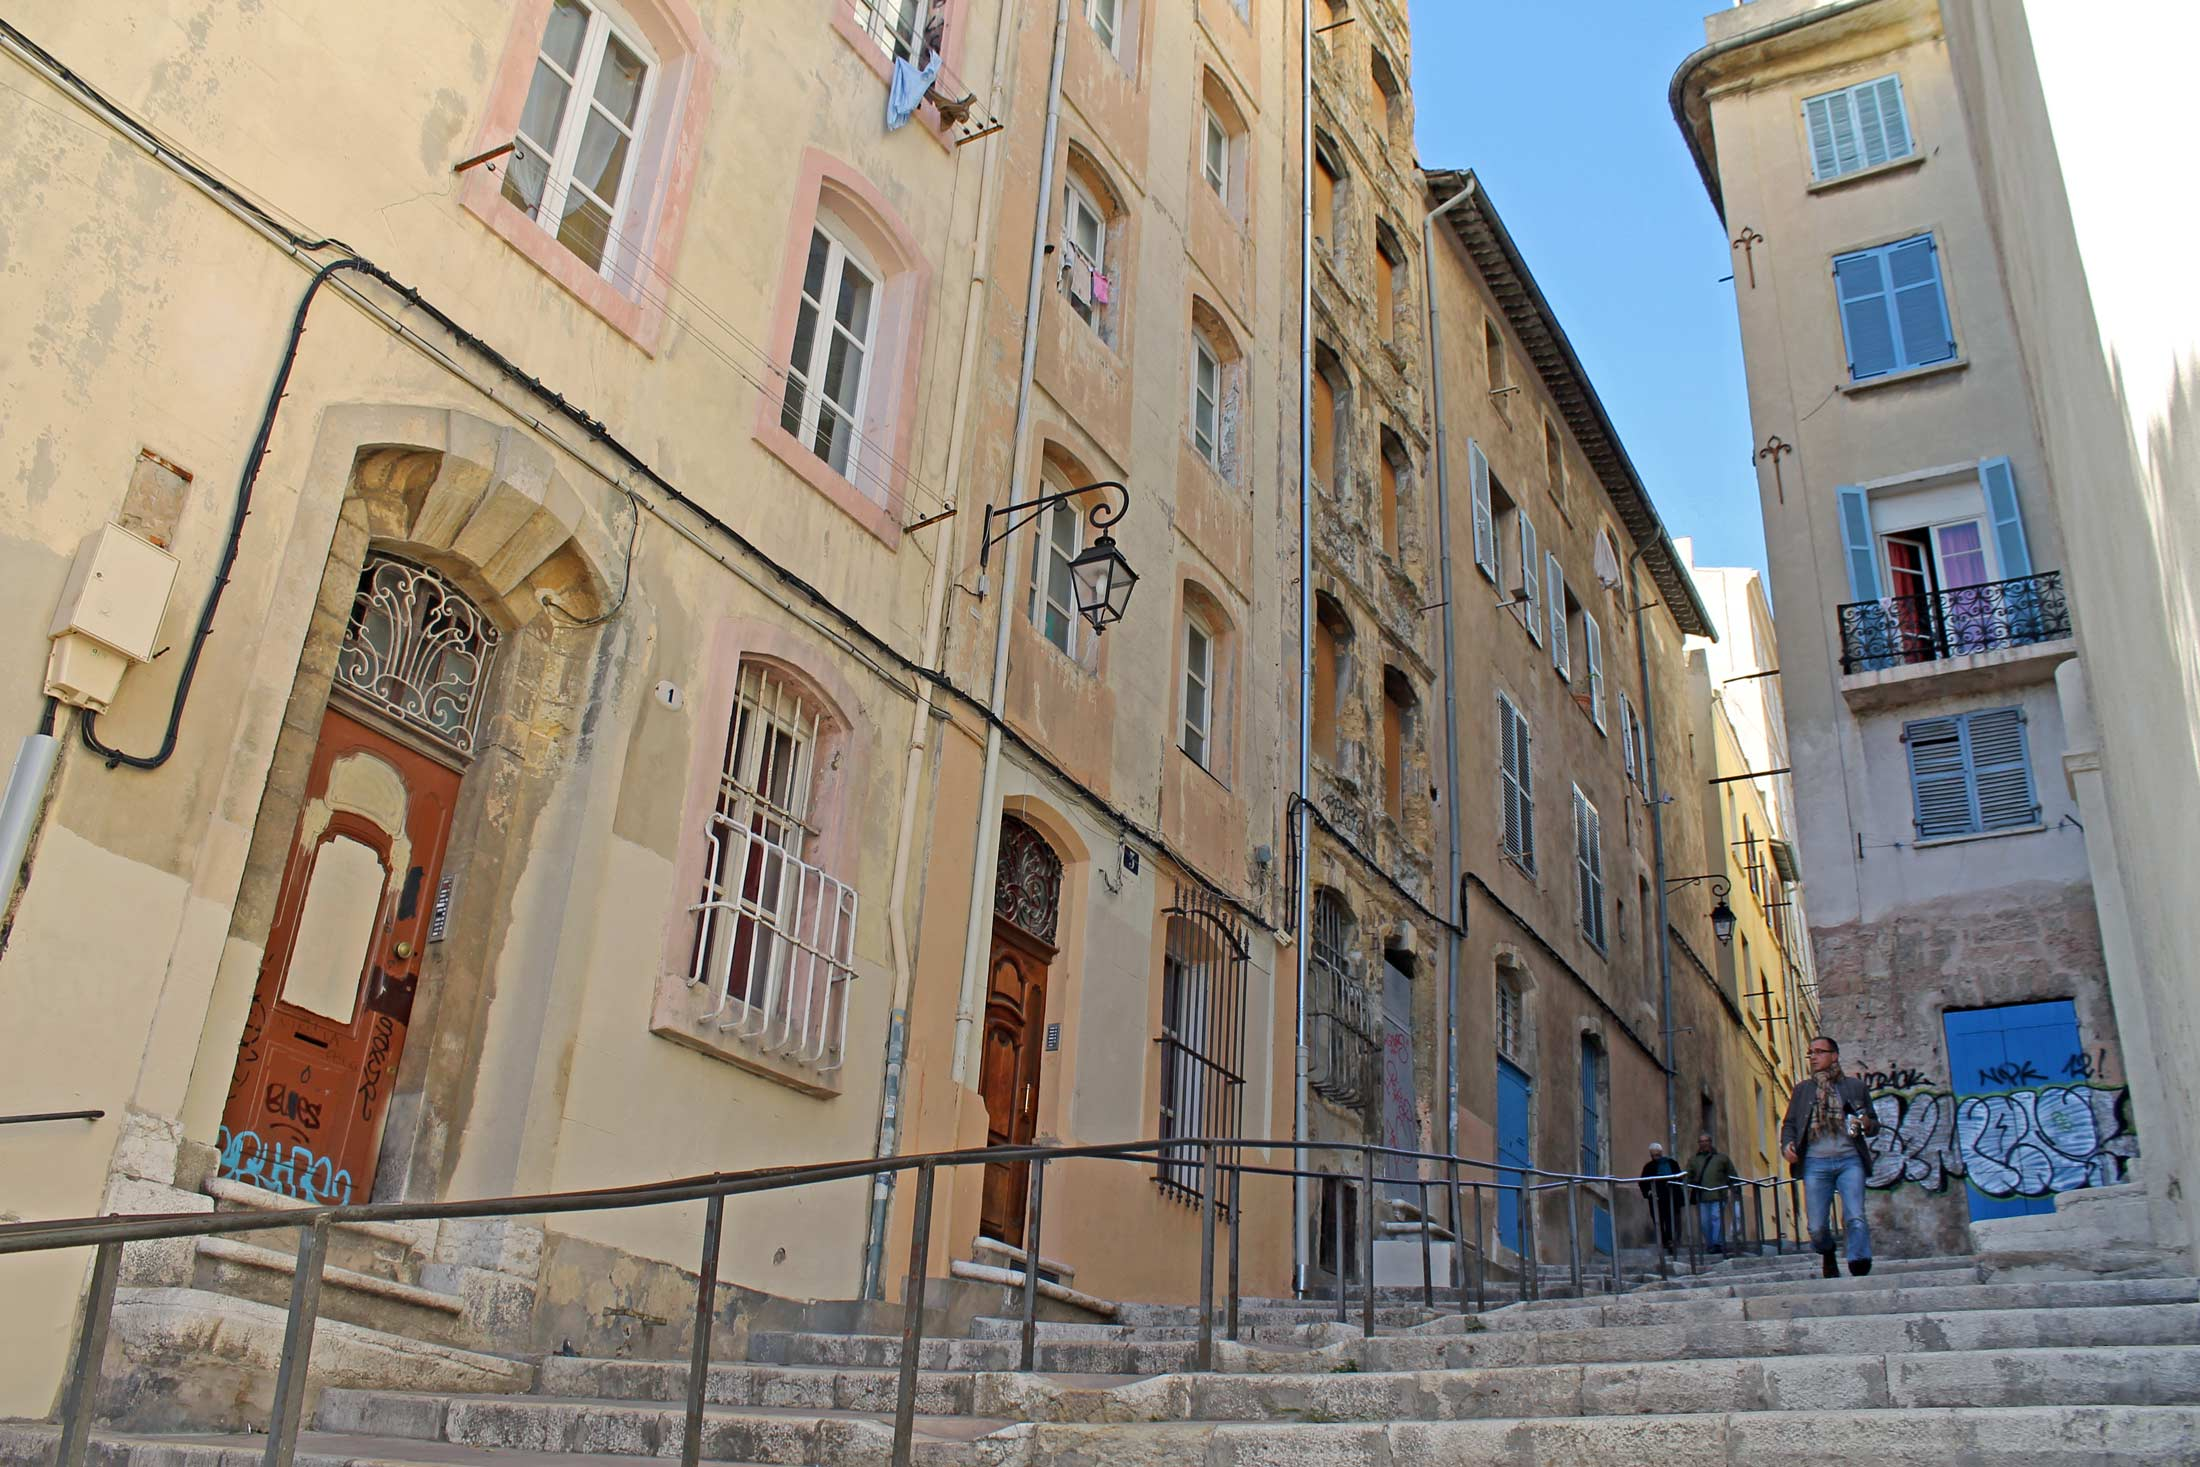 Le Panier in Marseille - Focal Journey (by Gustavo Espinola)